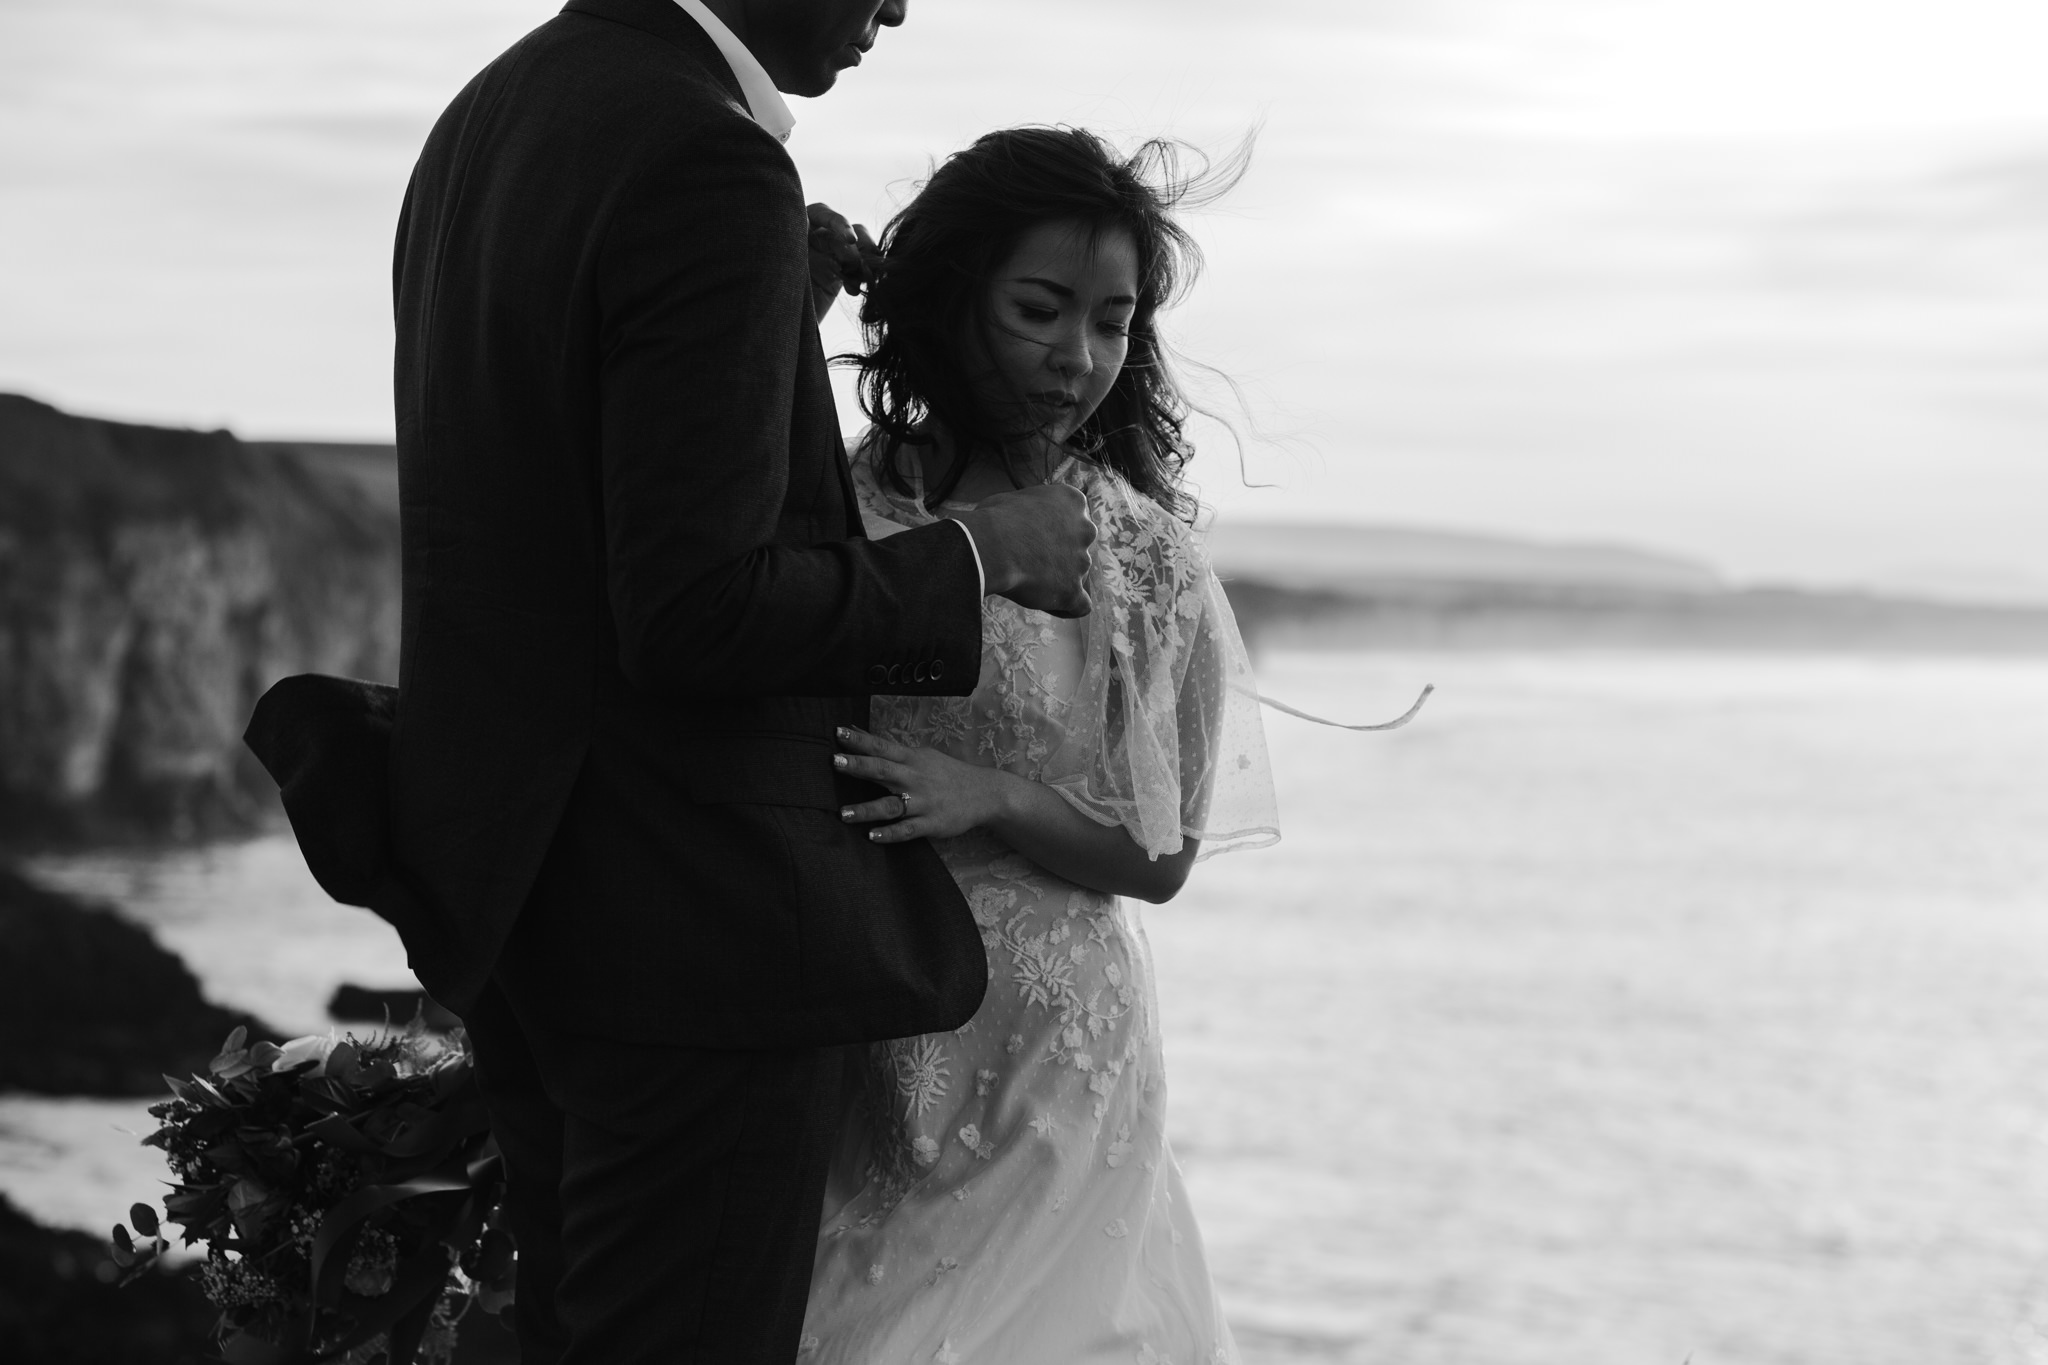 cinematic-emotive-adventure-elopement-photography-northern-ireland